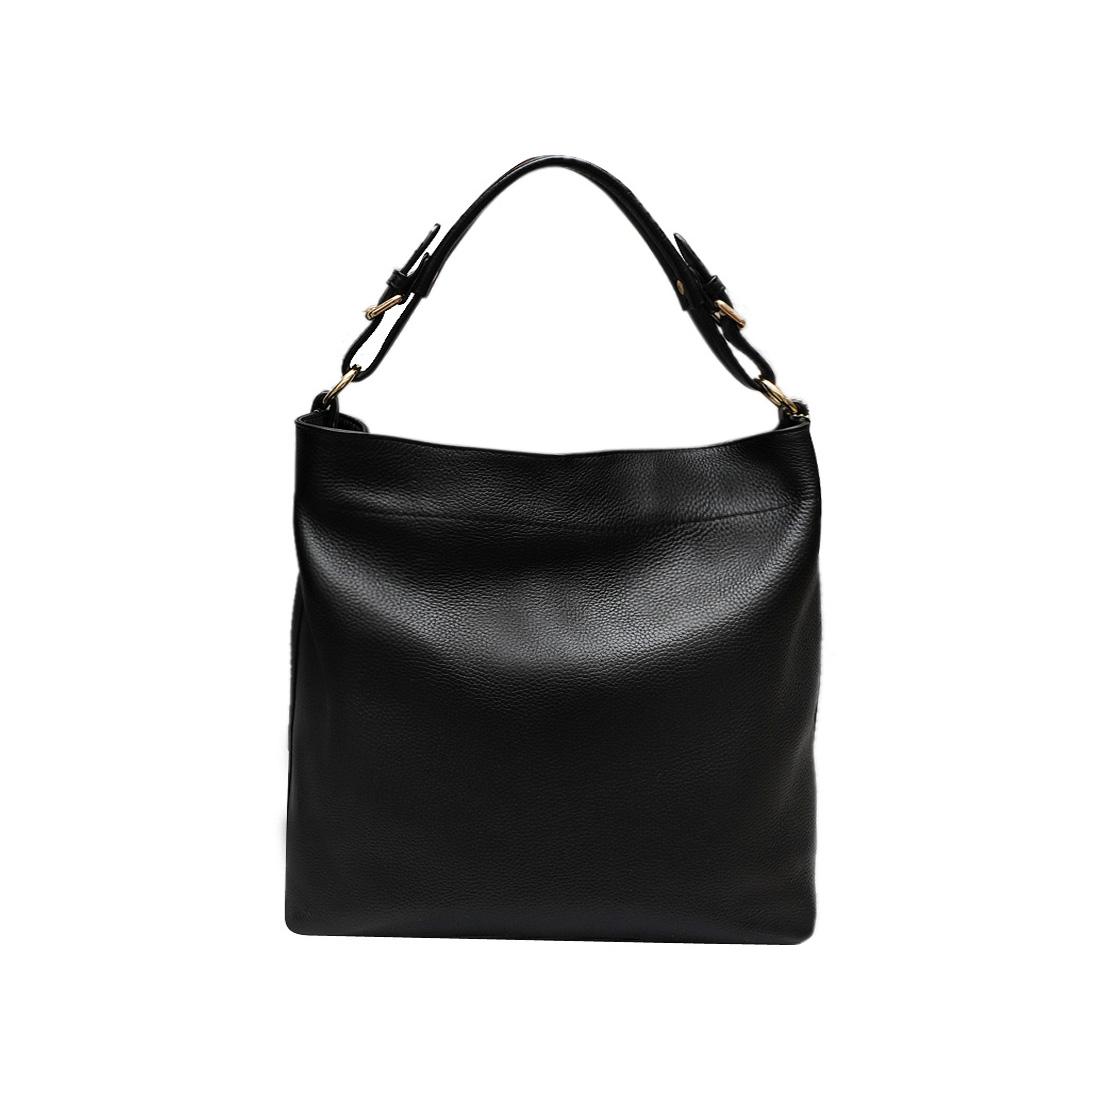 Túi xách tay nữ da bò thật cao cấp ELMI ET35